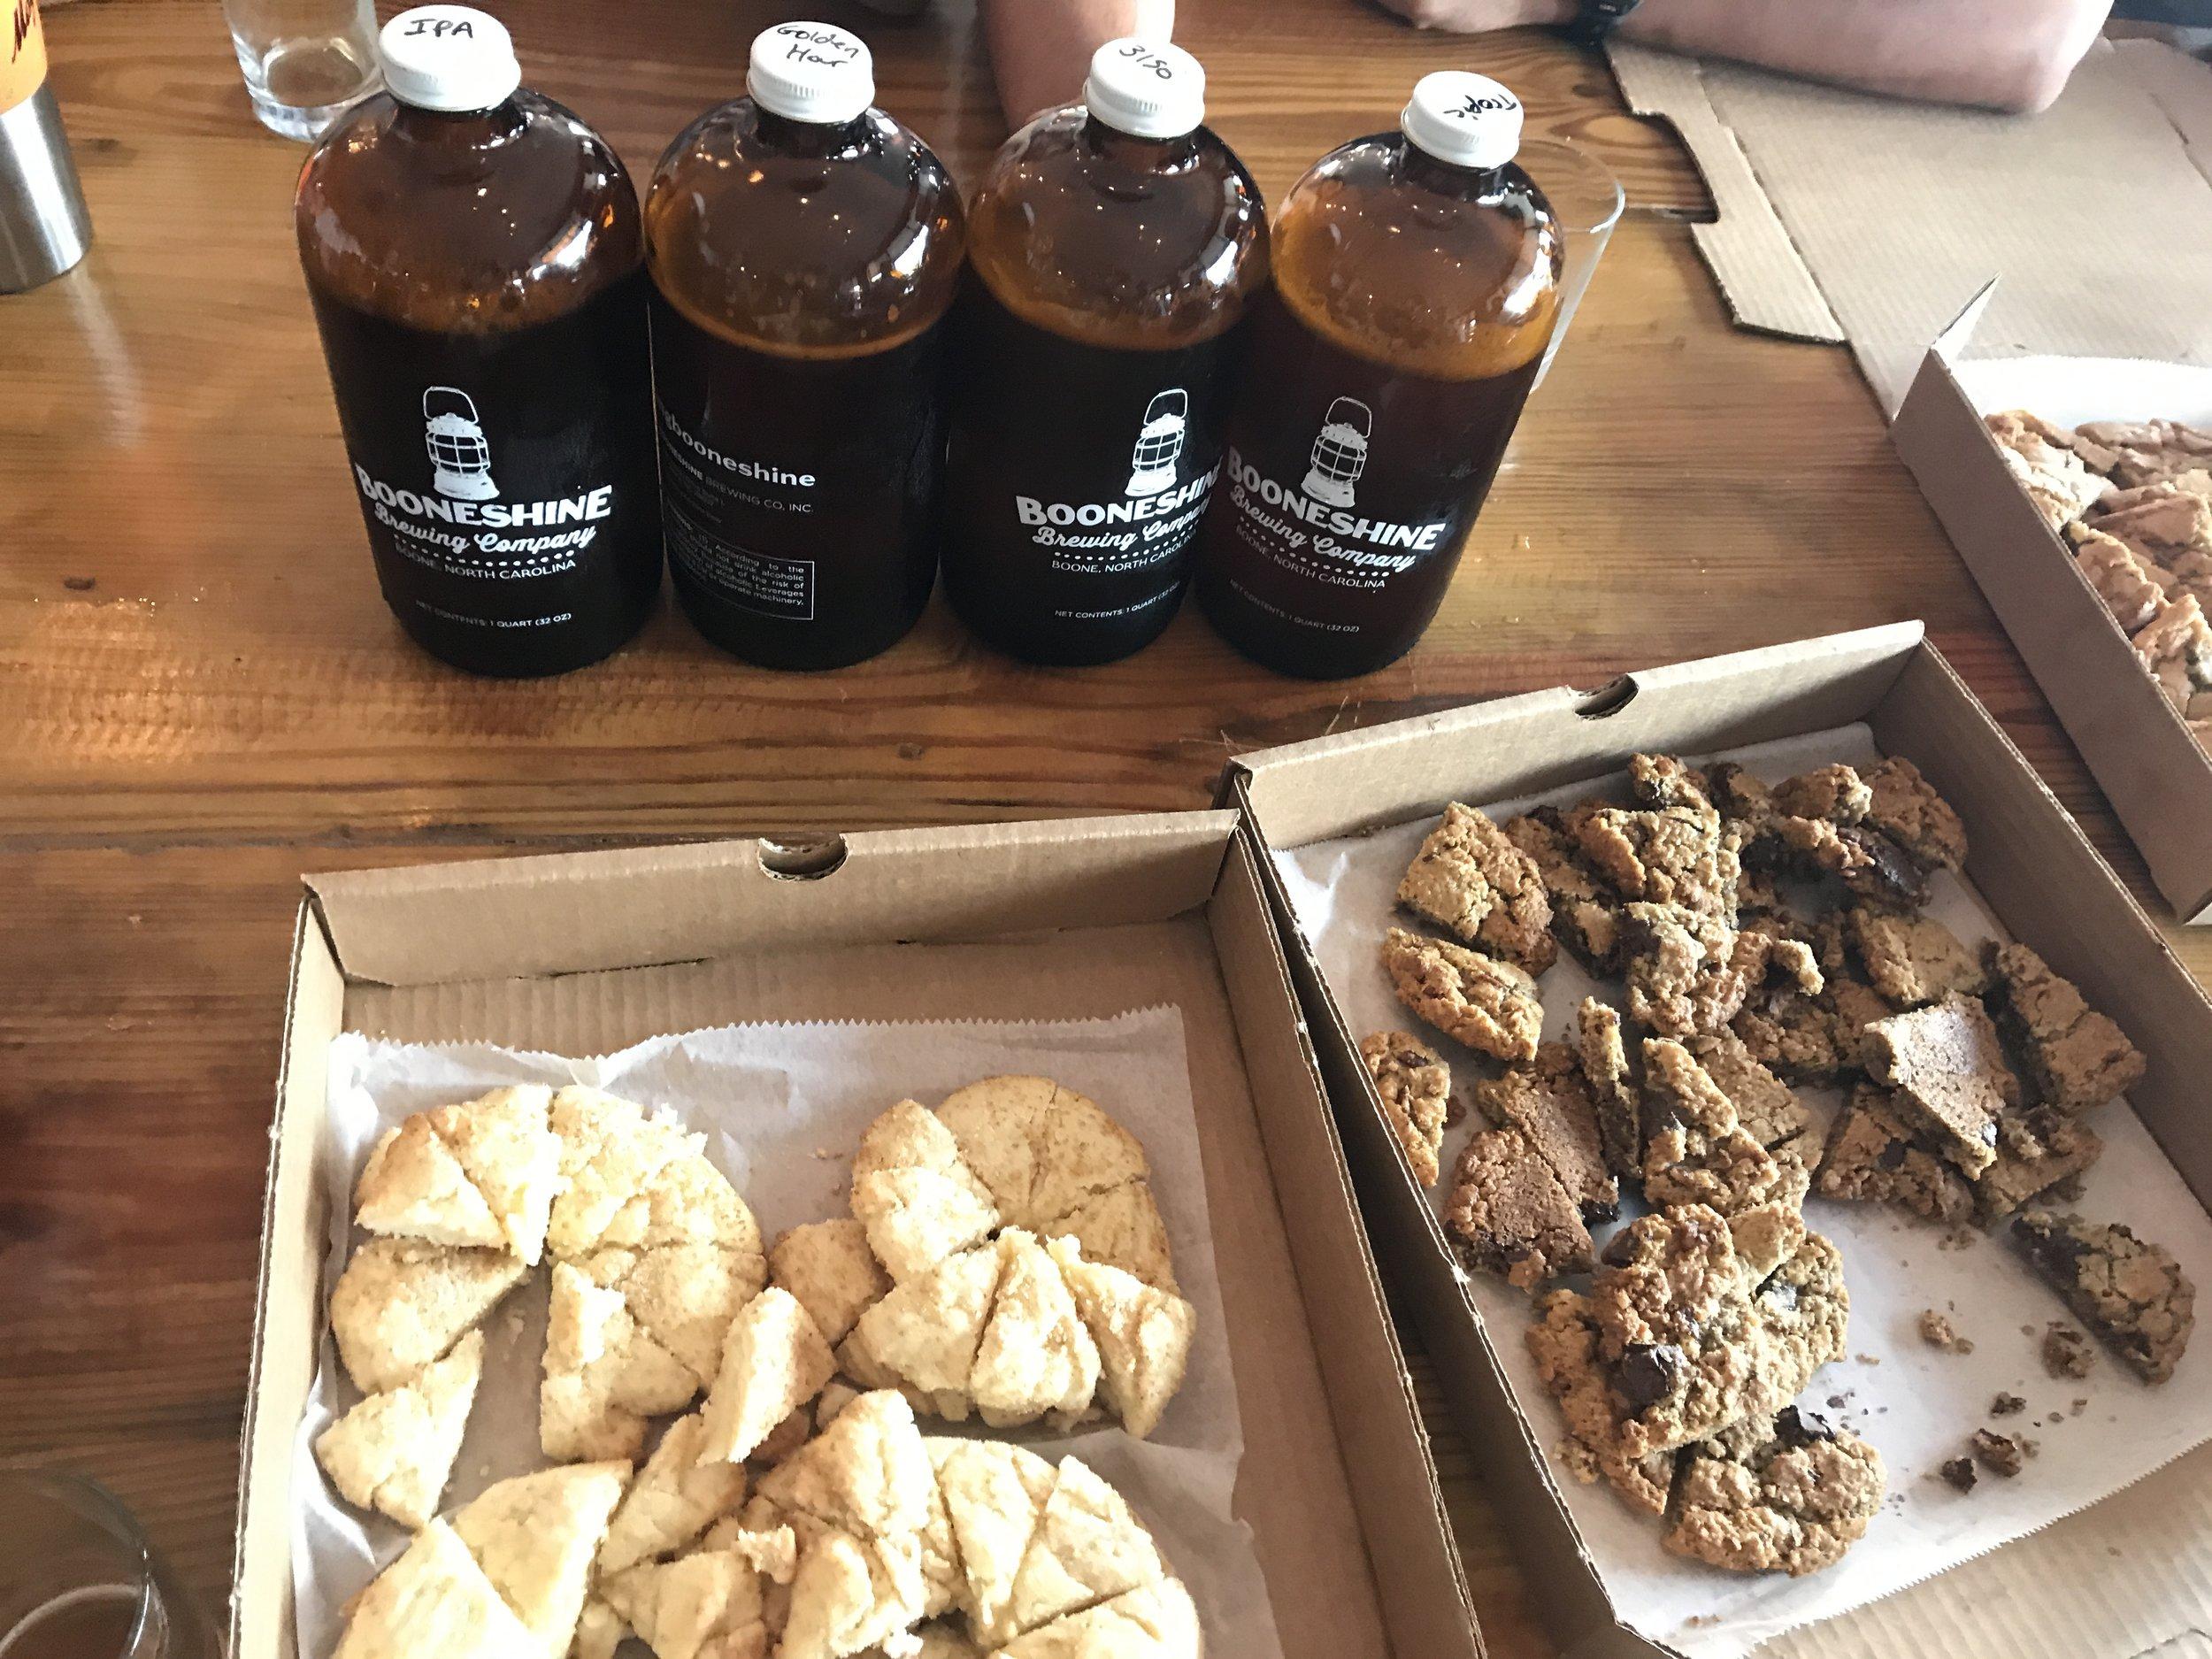 Appalachia Cookie Company - > Cookies: $3> Koozies: Free!> Stickers: Free!Vegan & Gluten Free Options